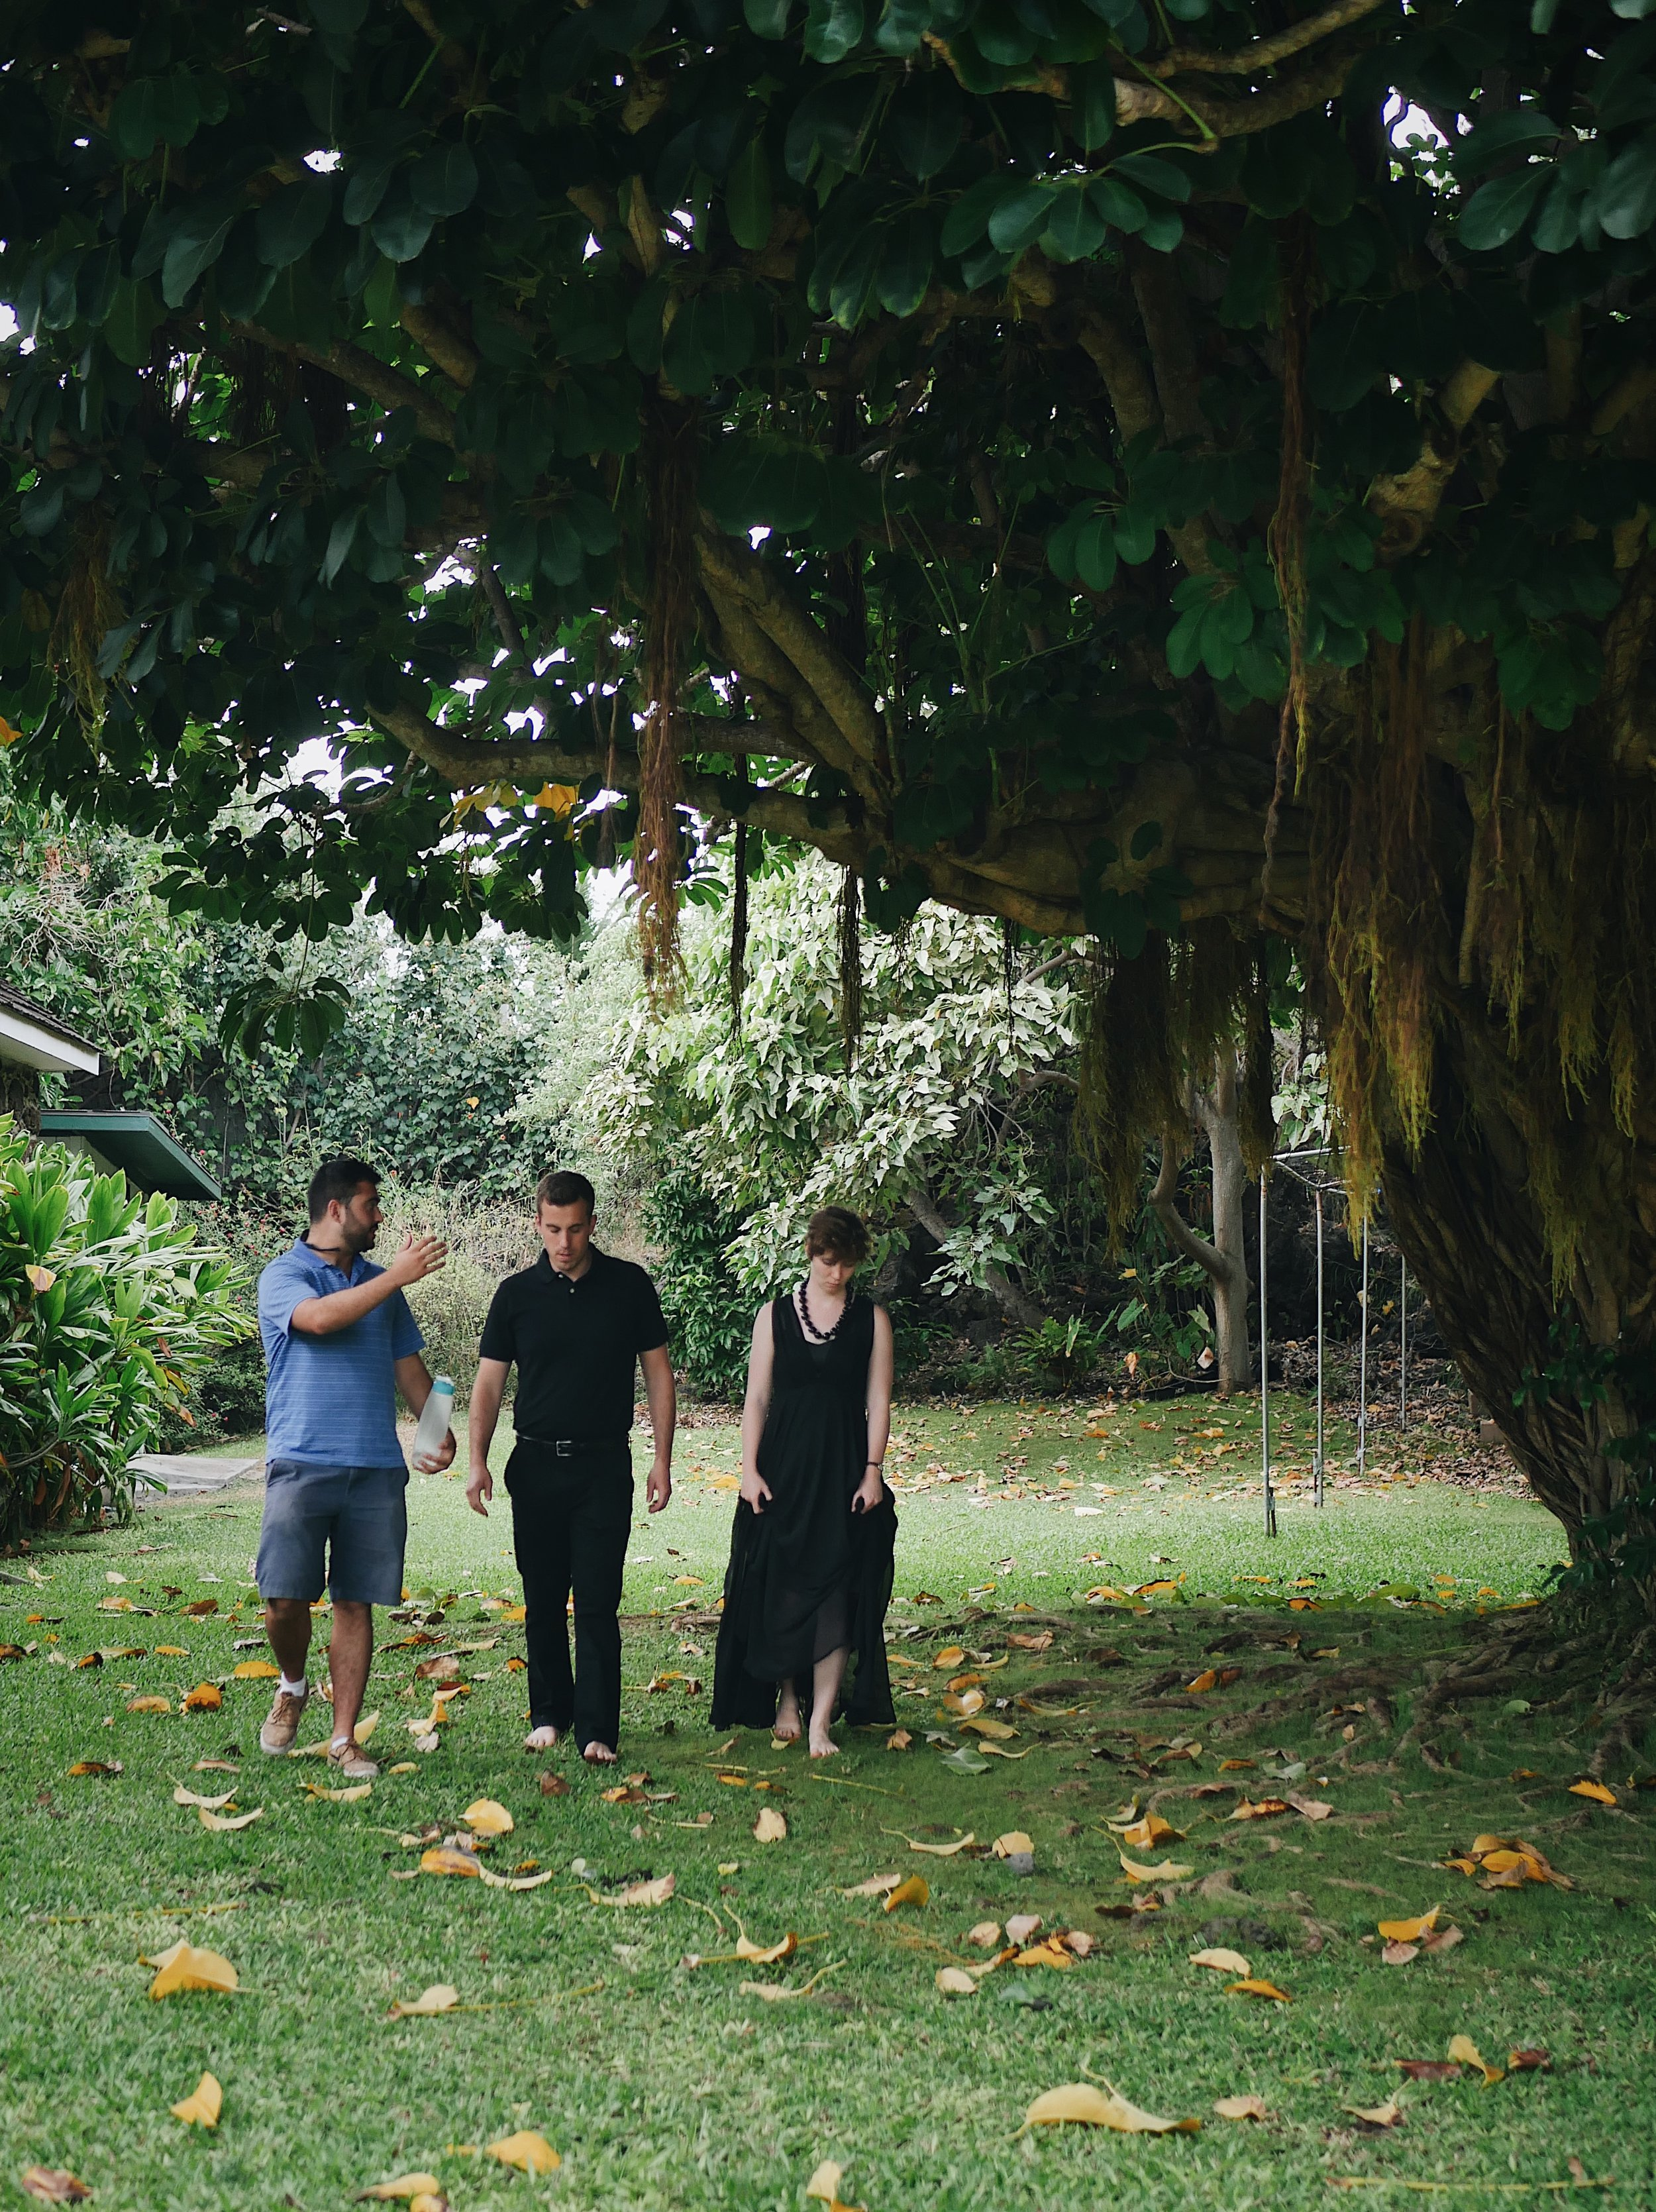 John Schafer, Steve Spinelli, and Brigid Lucey beneath a banyan tree beside Keawala'i Congregational Church